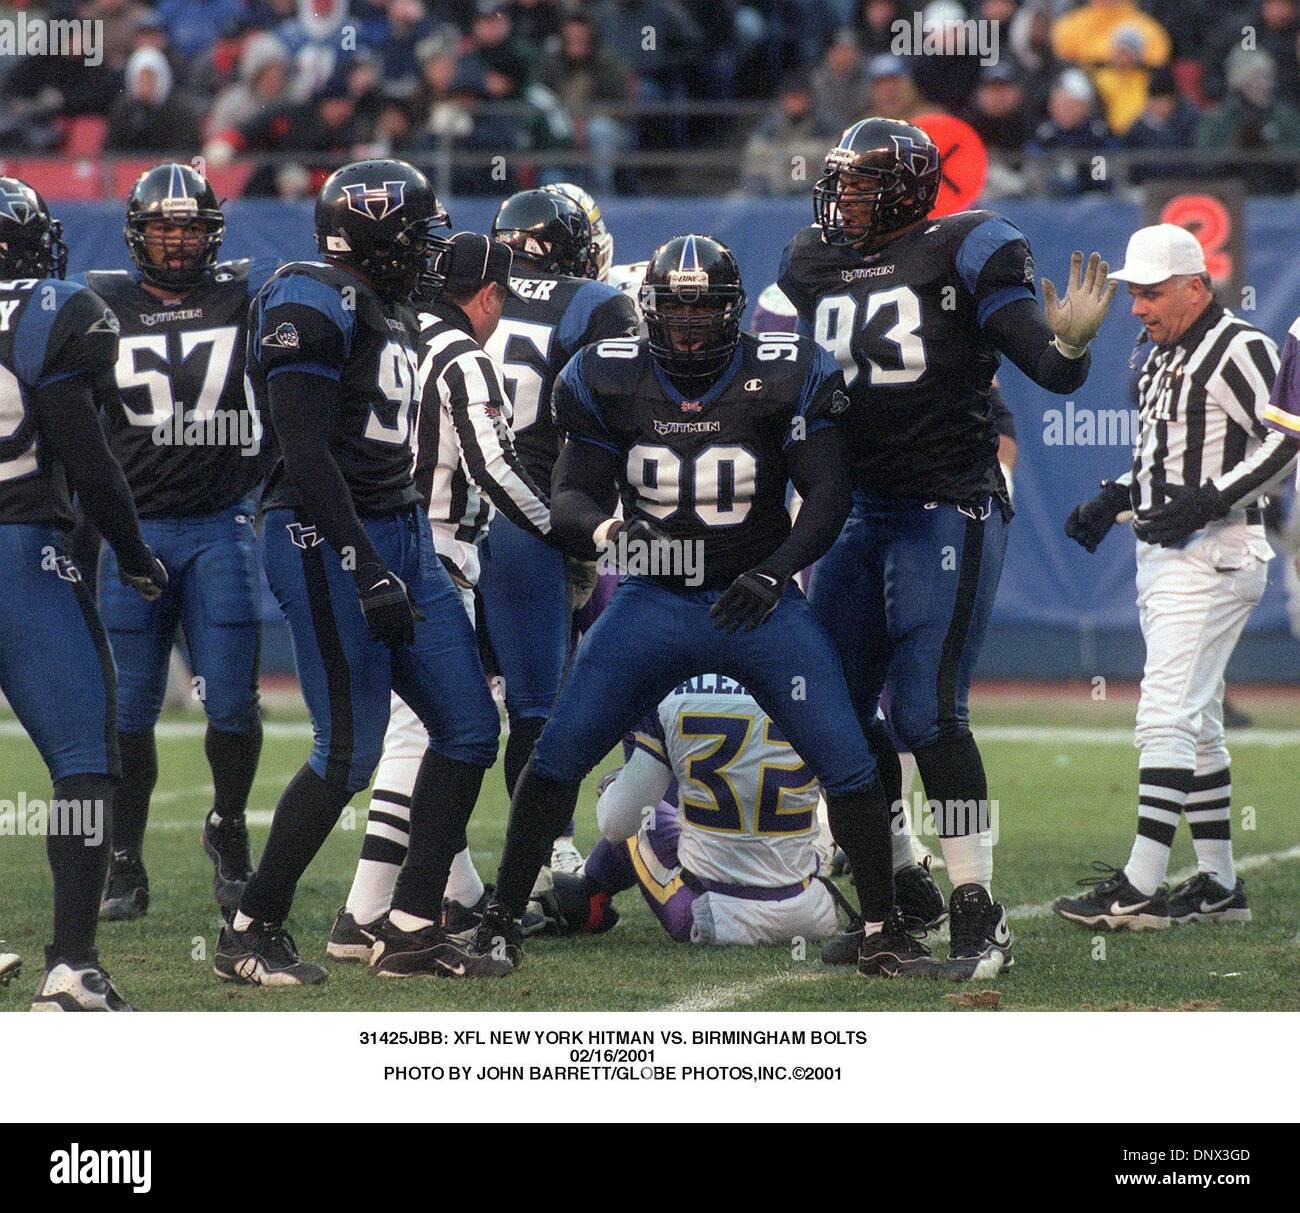 Feb. 16, 2001 - 31425JBB: XFL NEW YORK HITMAN VS. BIRMINGHAM BOLTS.02/16/2001. JOHN BARRETT/   2001(Credit Image: © Globe Photos/ZUMAPRESS.com) Stock Photo